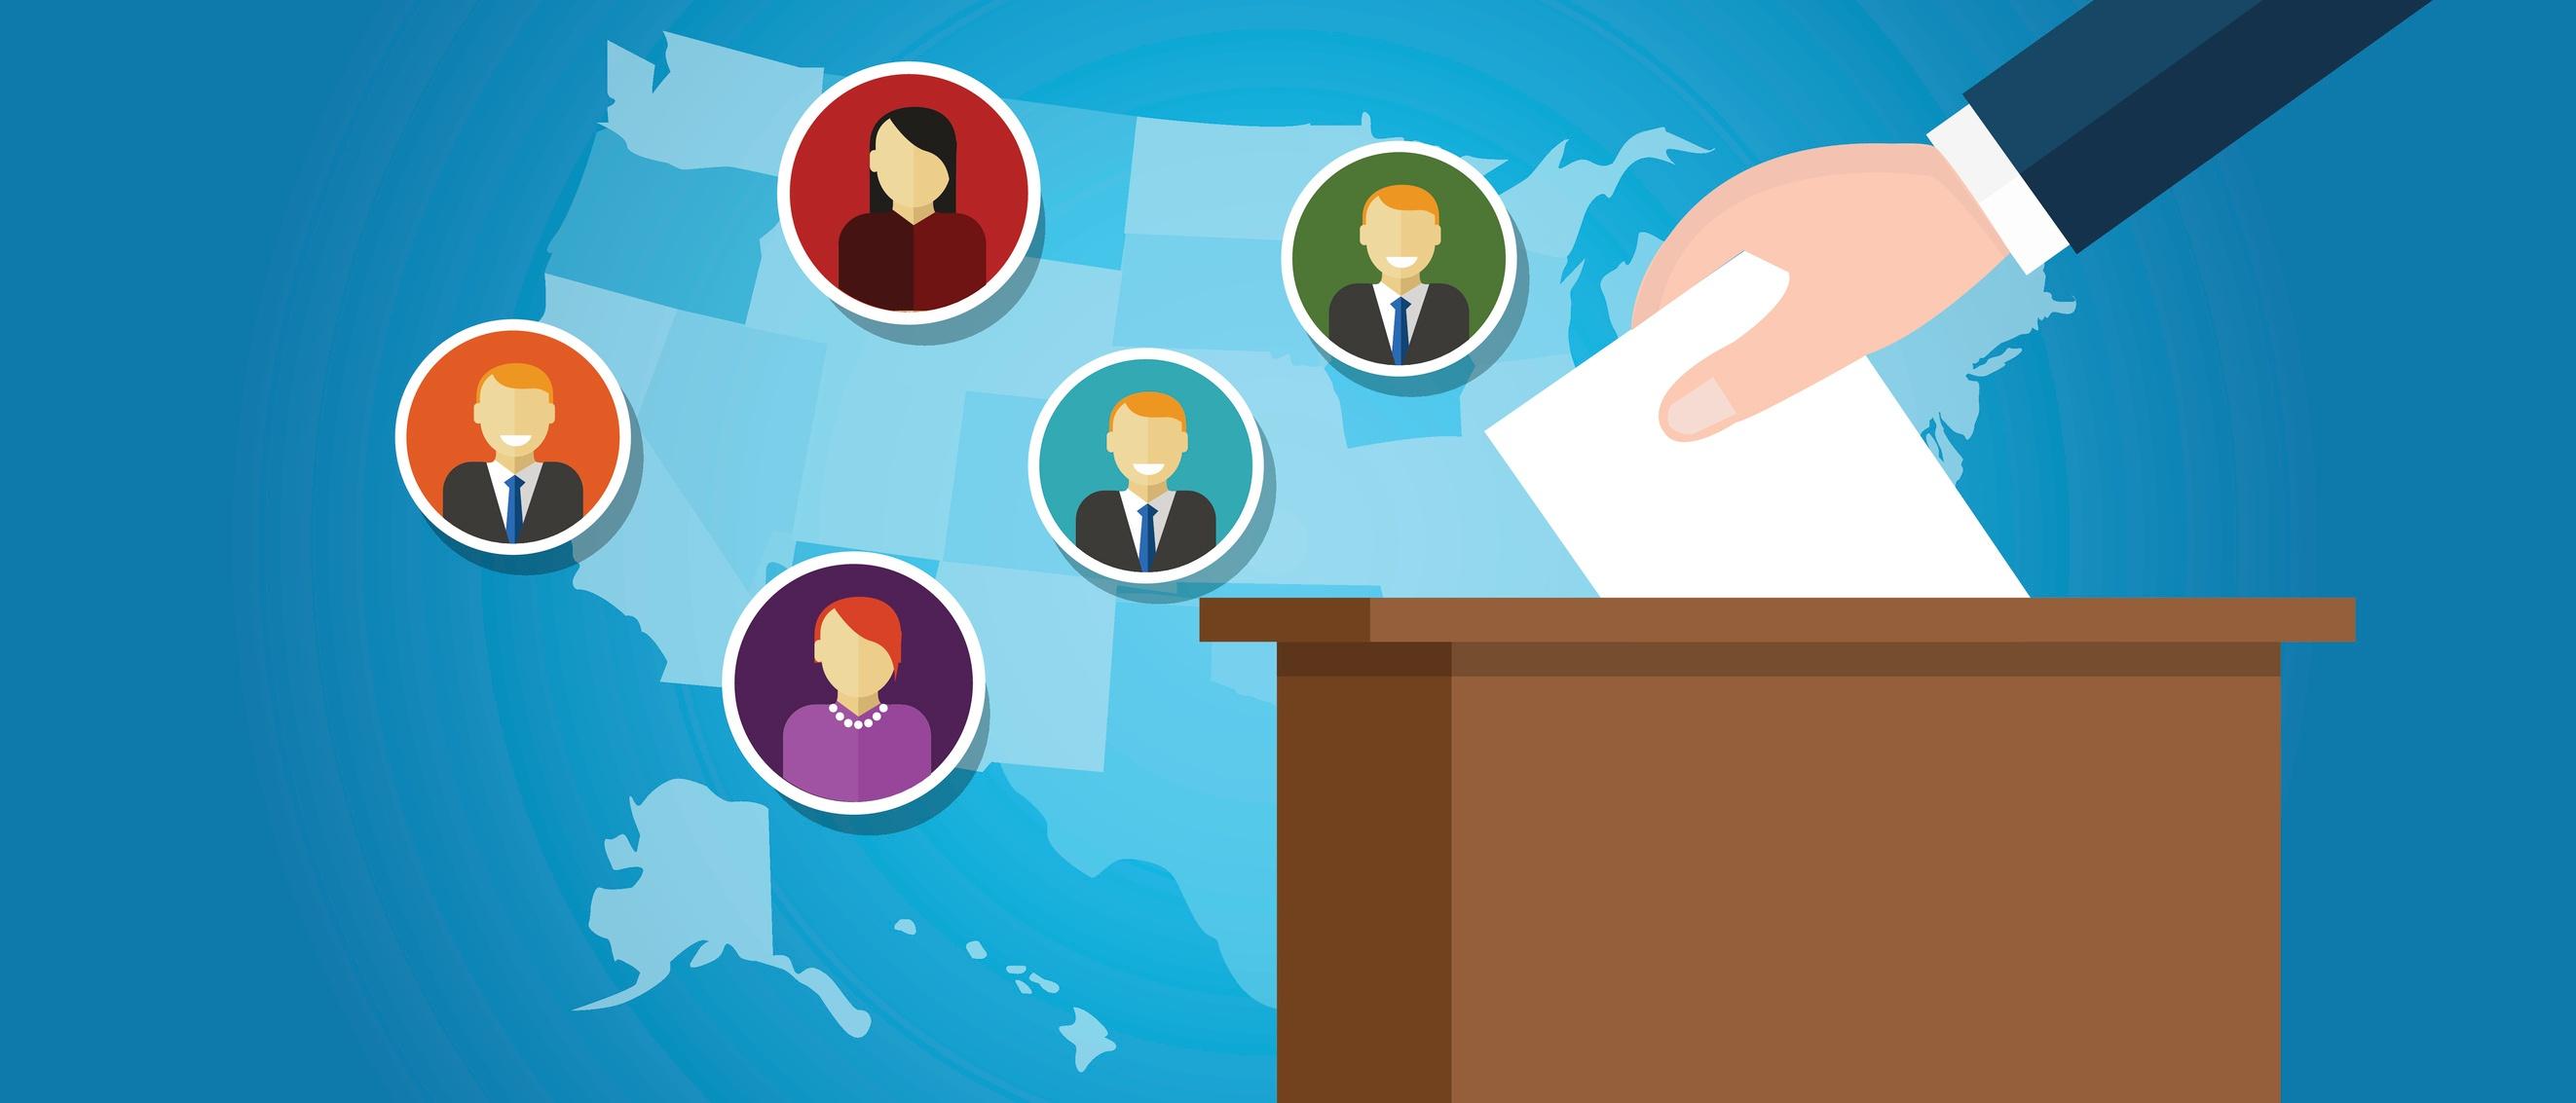 illustration-electoral-college-representatives-voting